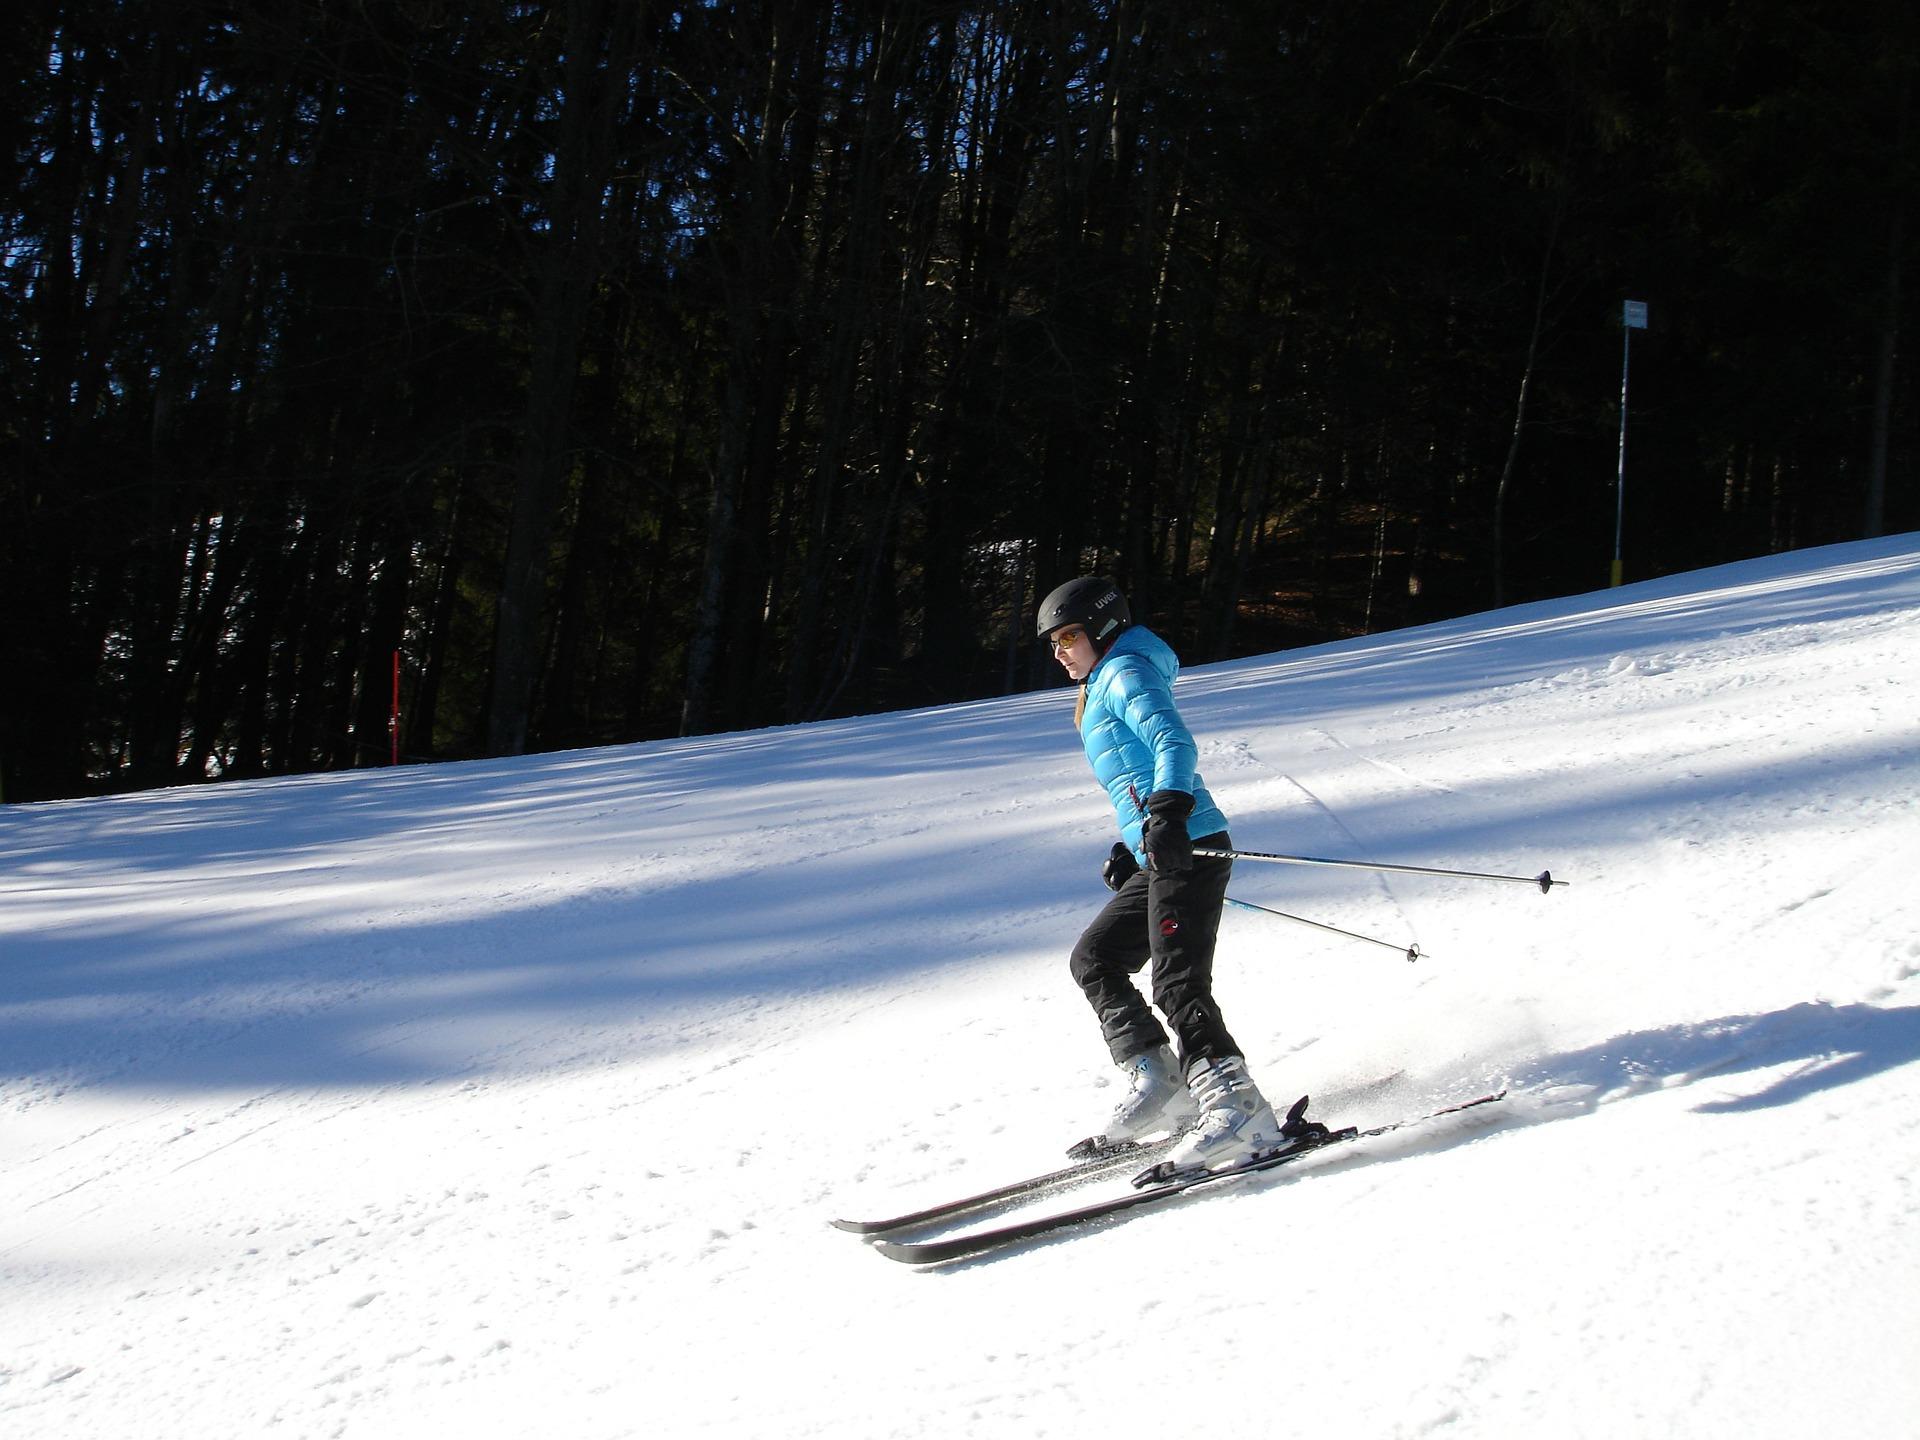 Prepping for an injury-free ski trip